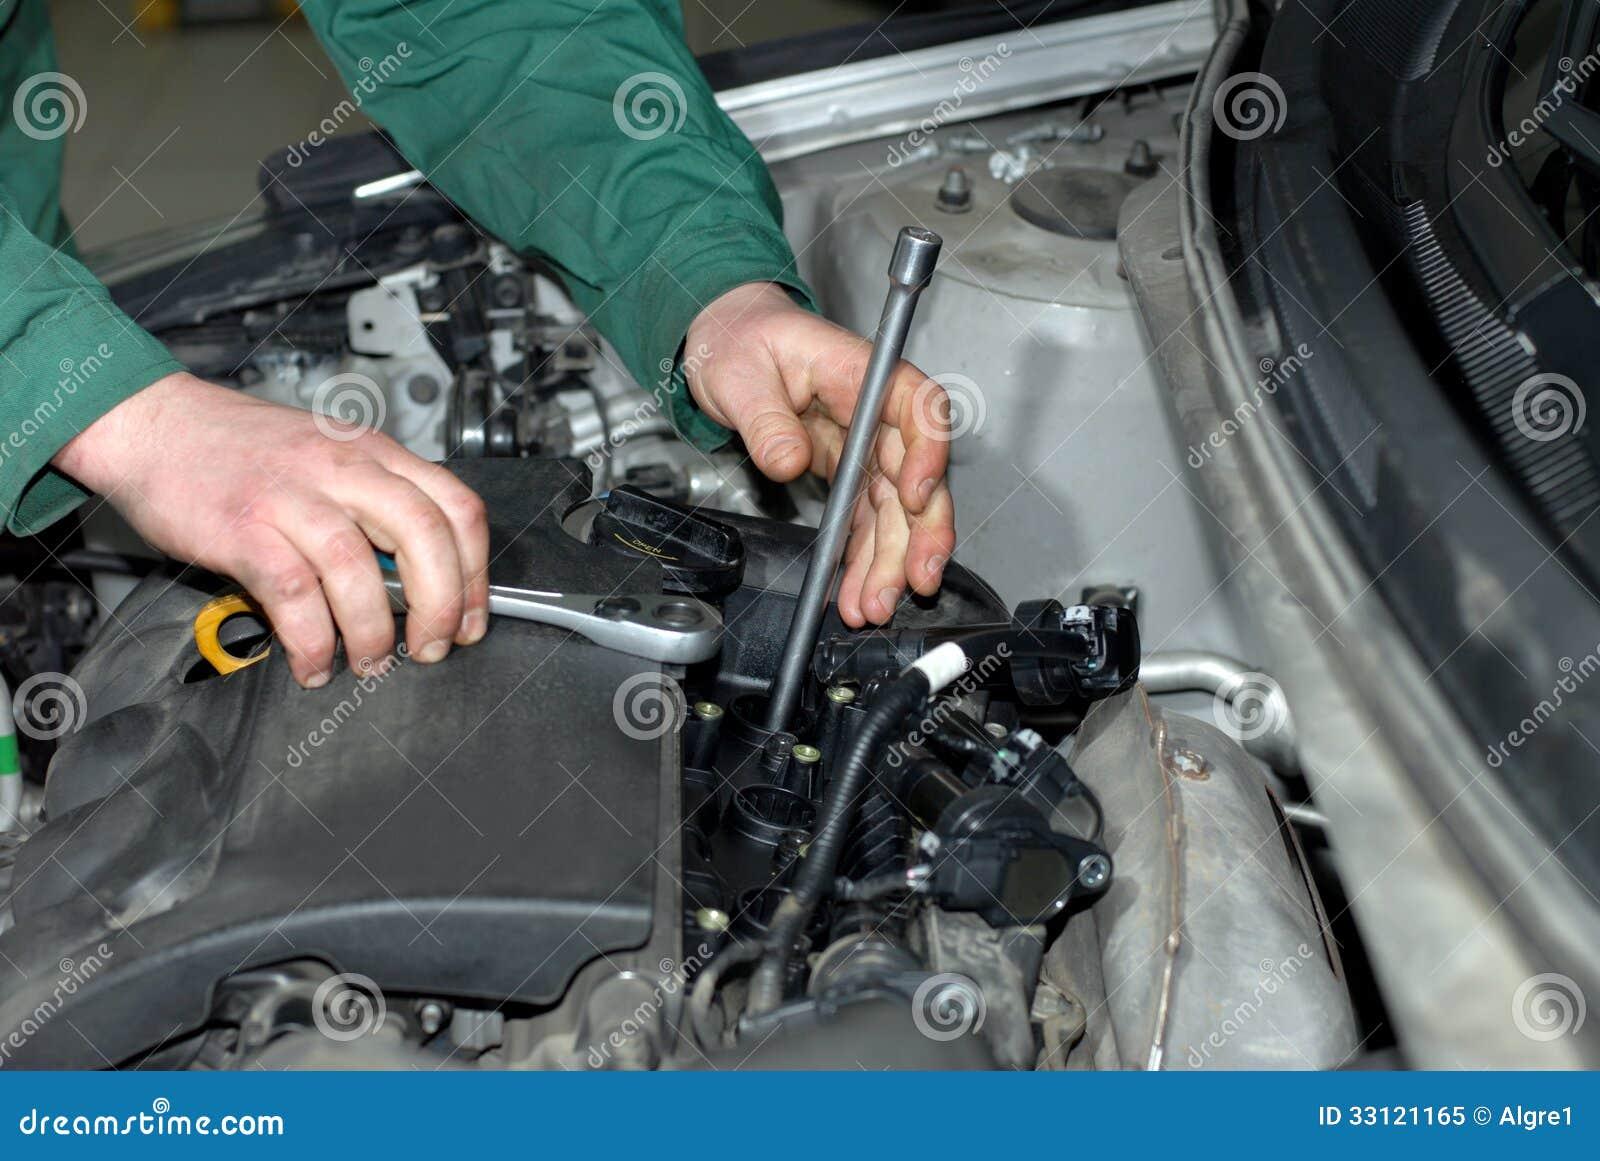 Auto Repair Shop Royalty Free Stock Photo Image 33121165: motor vehicle repair